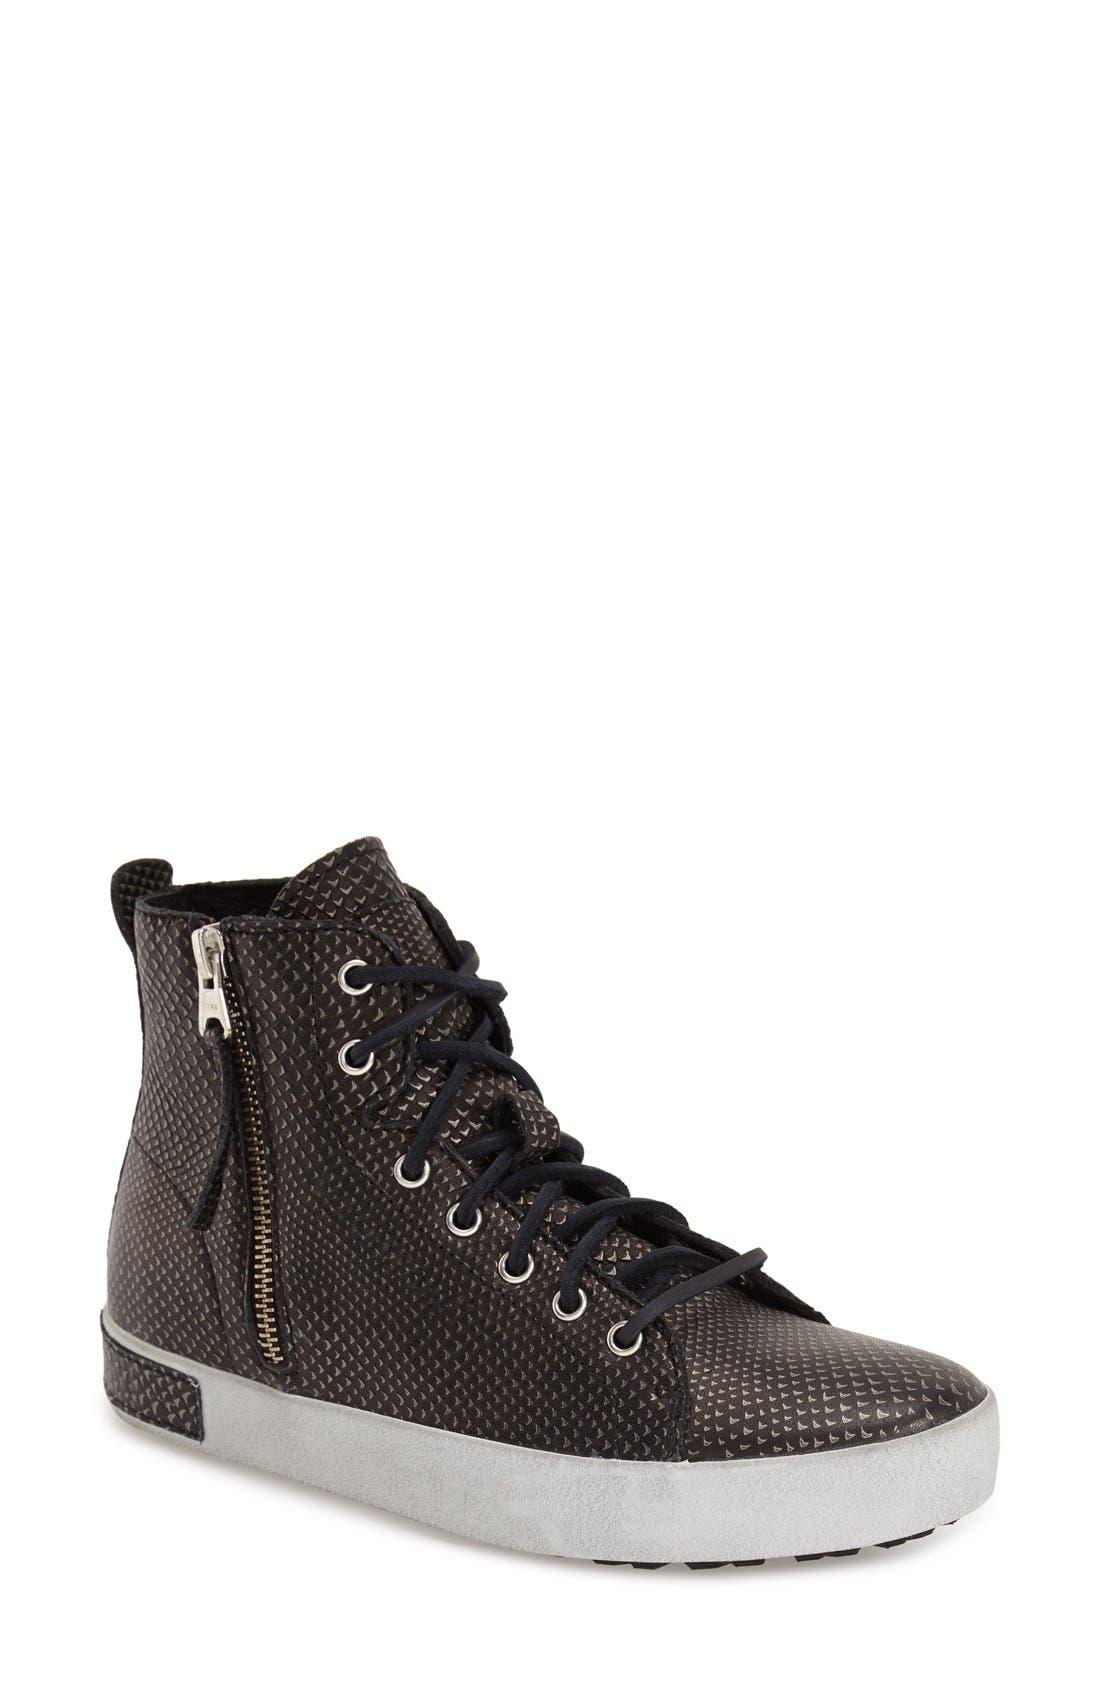 Alternate Image 1 Selected - Blackstone 'KL57' High Top Sneaker (Women)